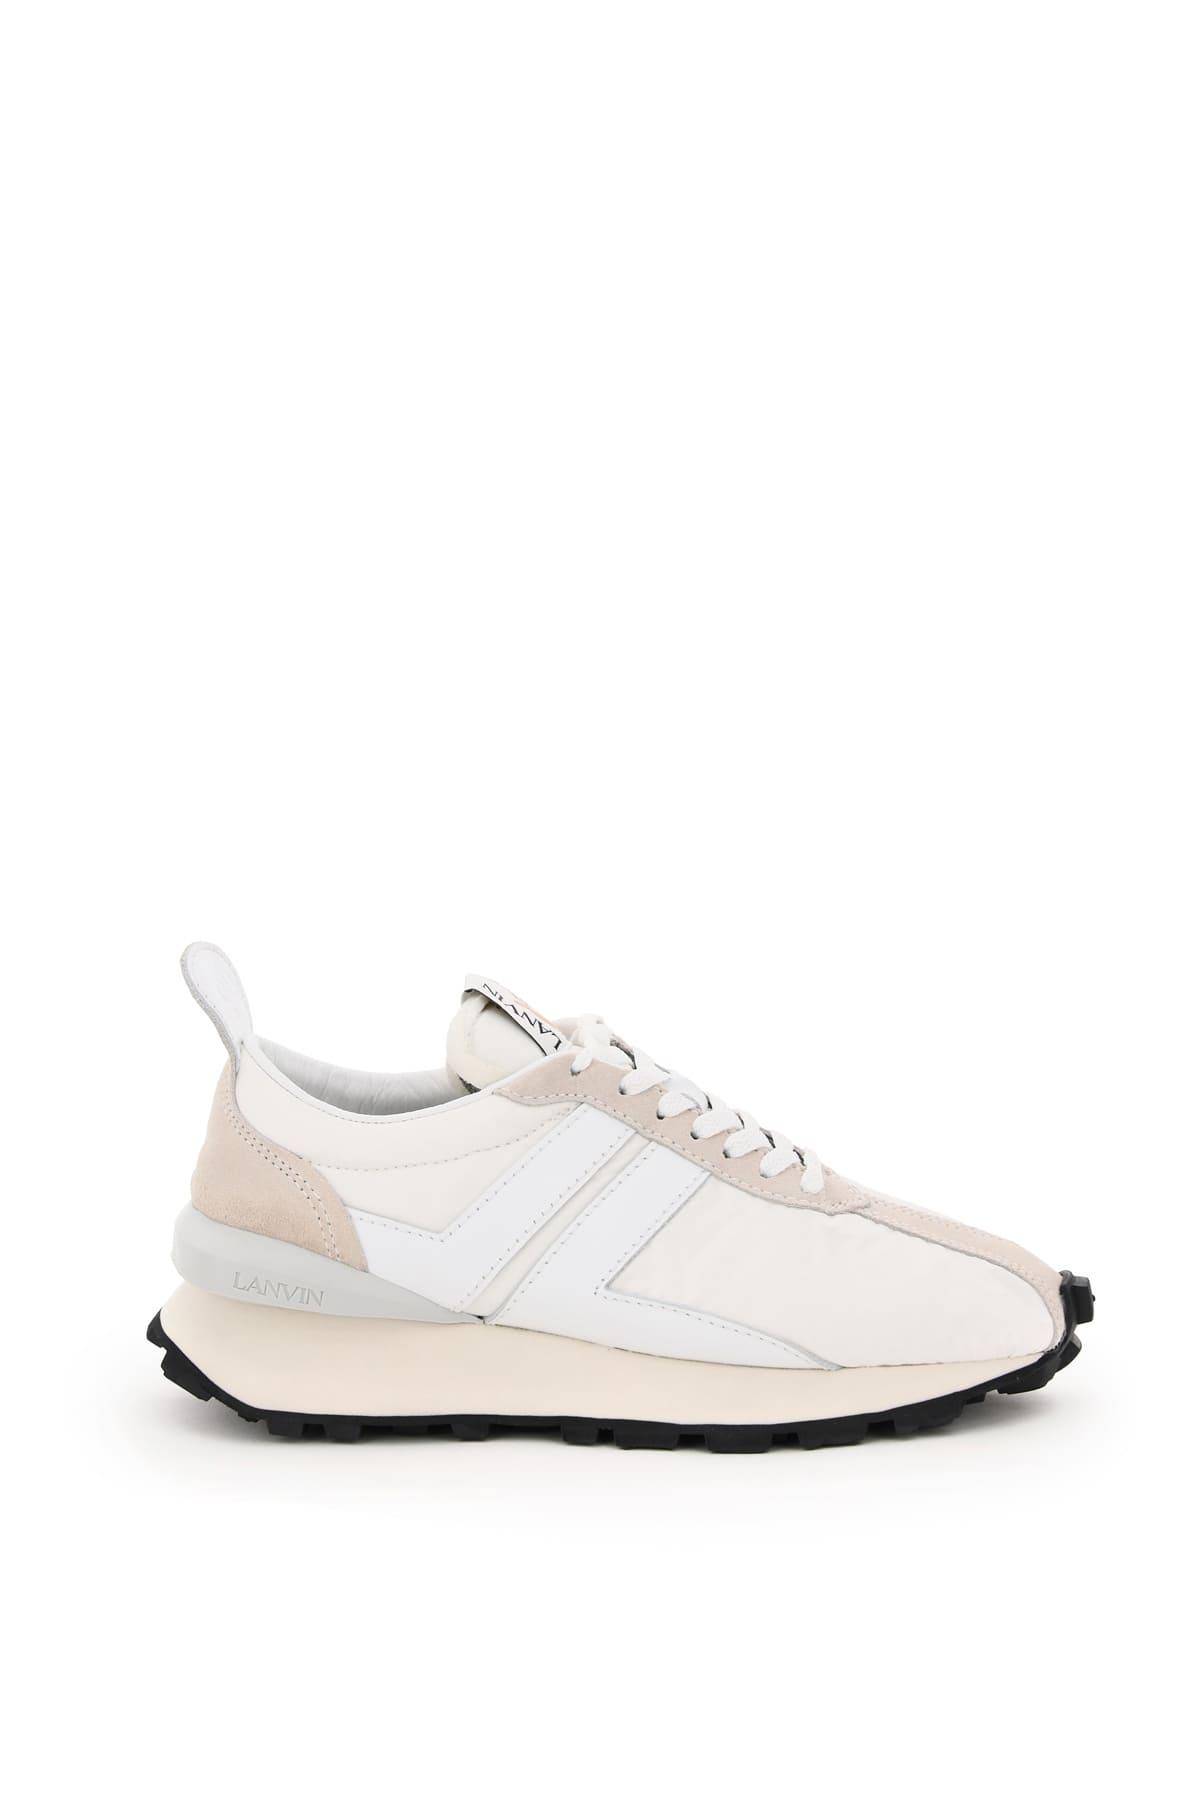 LANVIN BUMPER SNEAKERS 40 White, Beige, Grey Leather, Technical